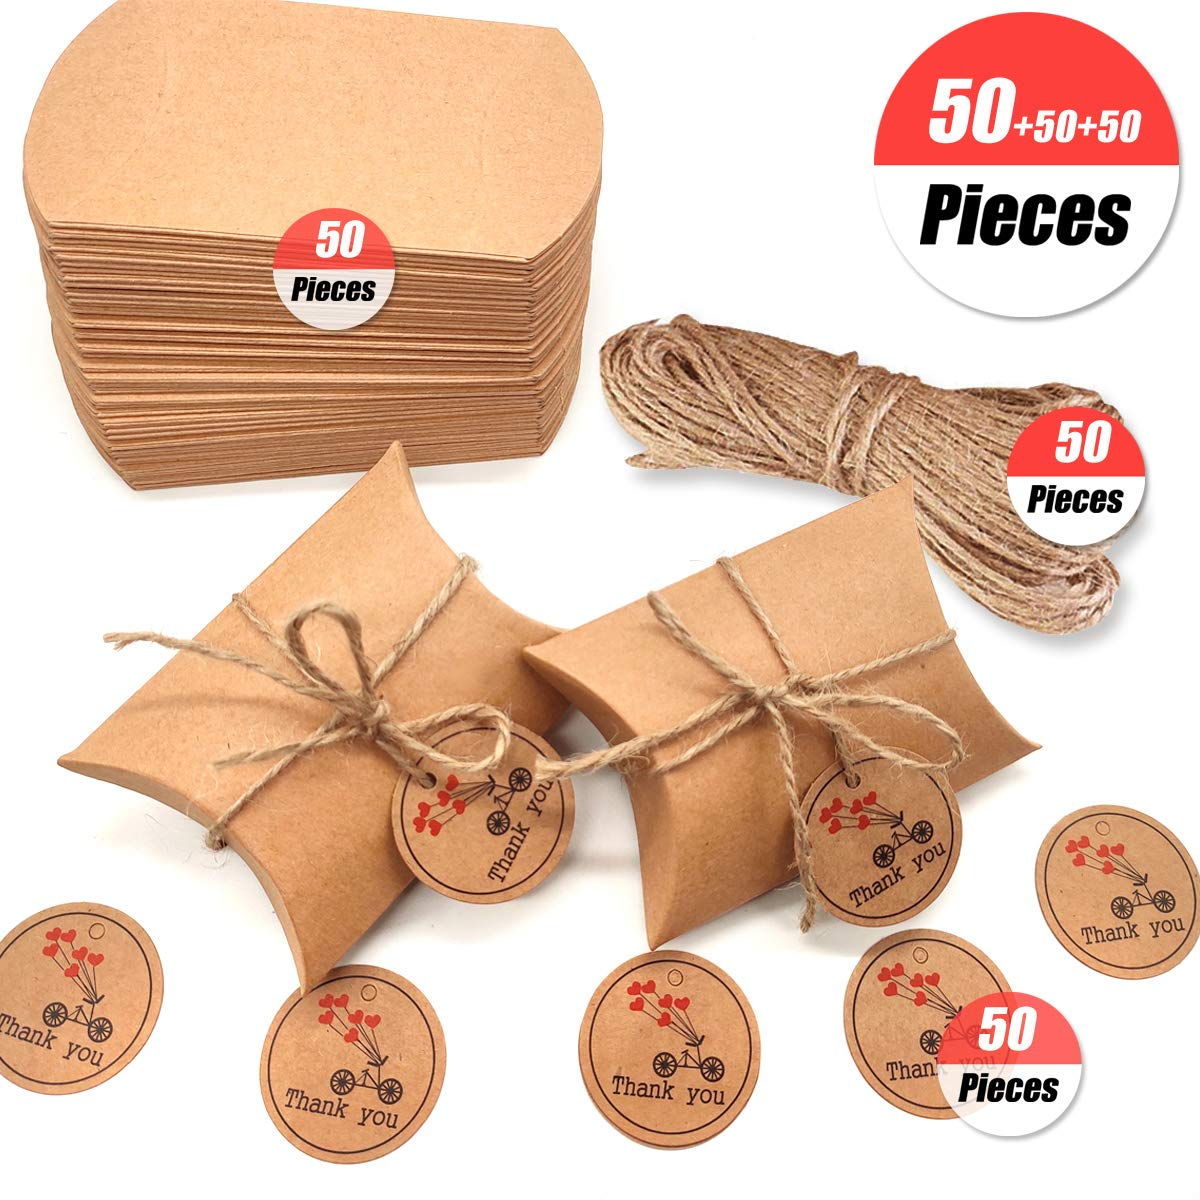 YuChiSX 50PCS Carta Kraft Cuscino Shape Vintage Wedding Favor Gift Box Party Candy Borsa con Corda Creativo Felice Dolce Regalo Verde pacchi Cowhide Pillow Box Multi Festa di Compleanno